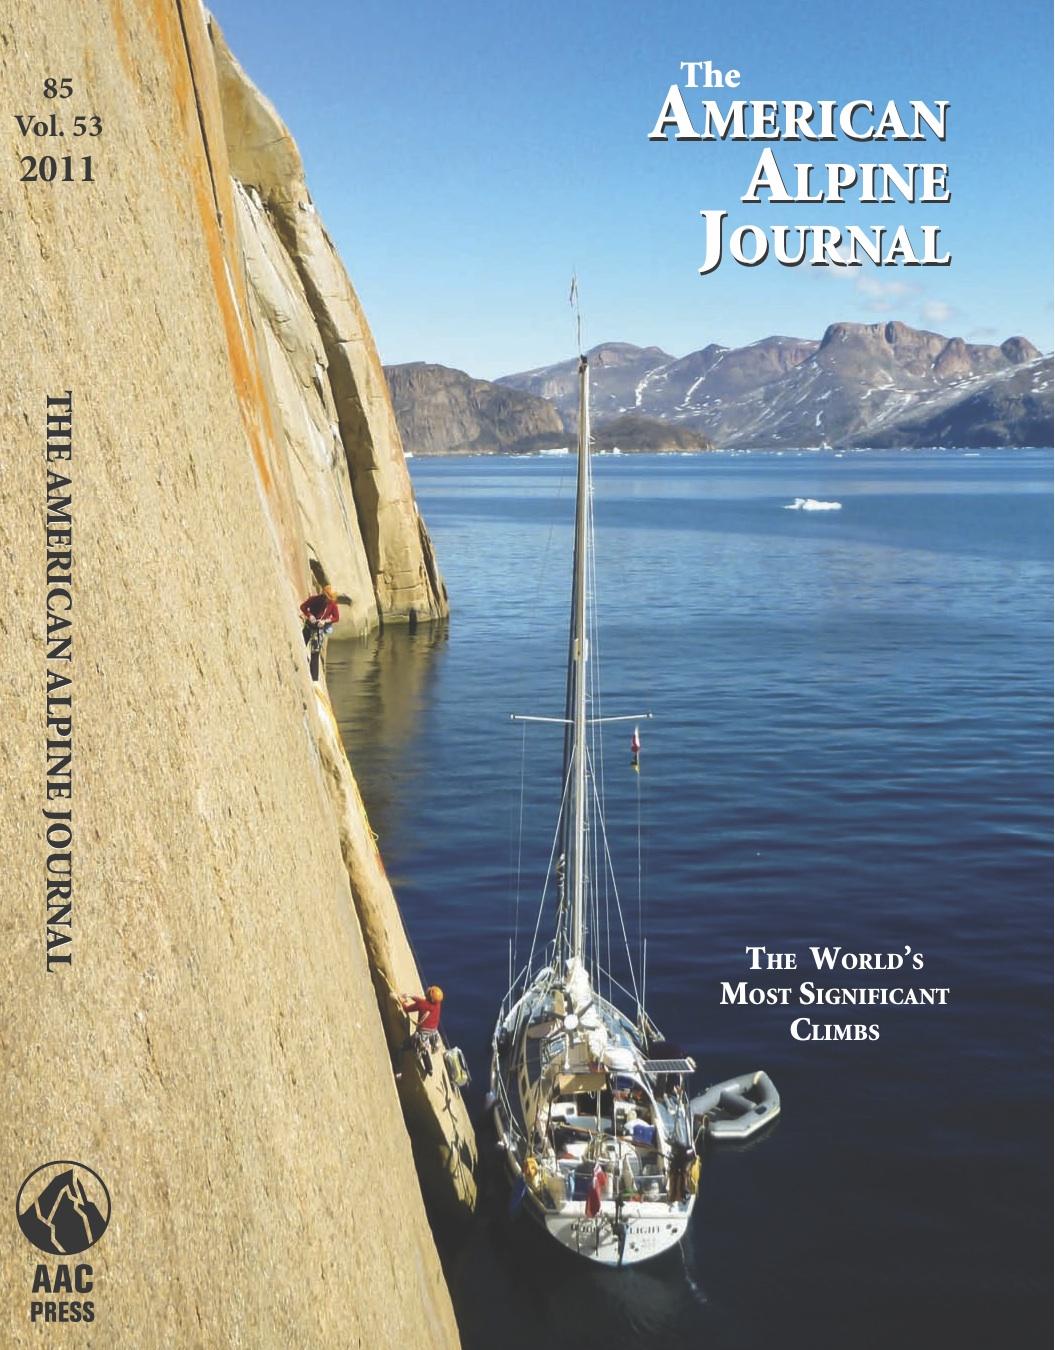 2011 AAJ cover